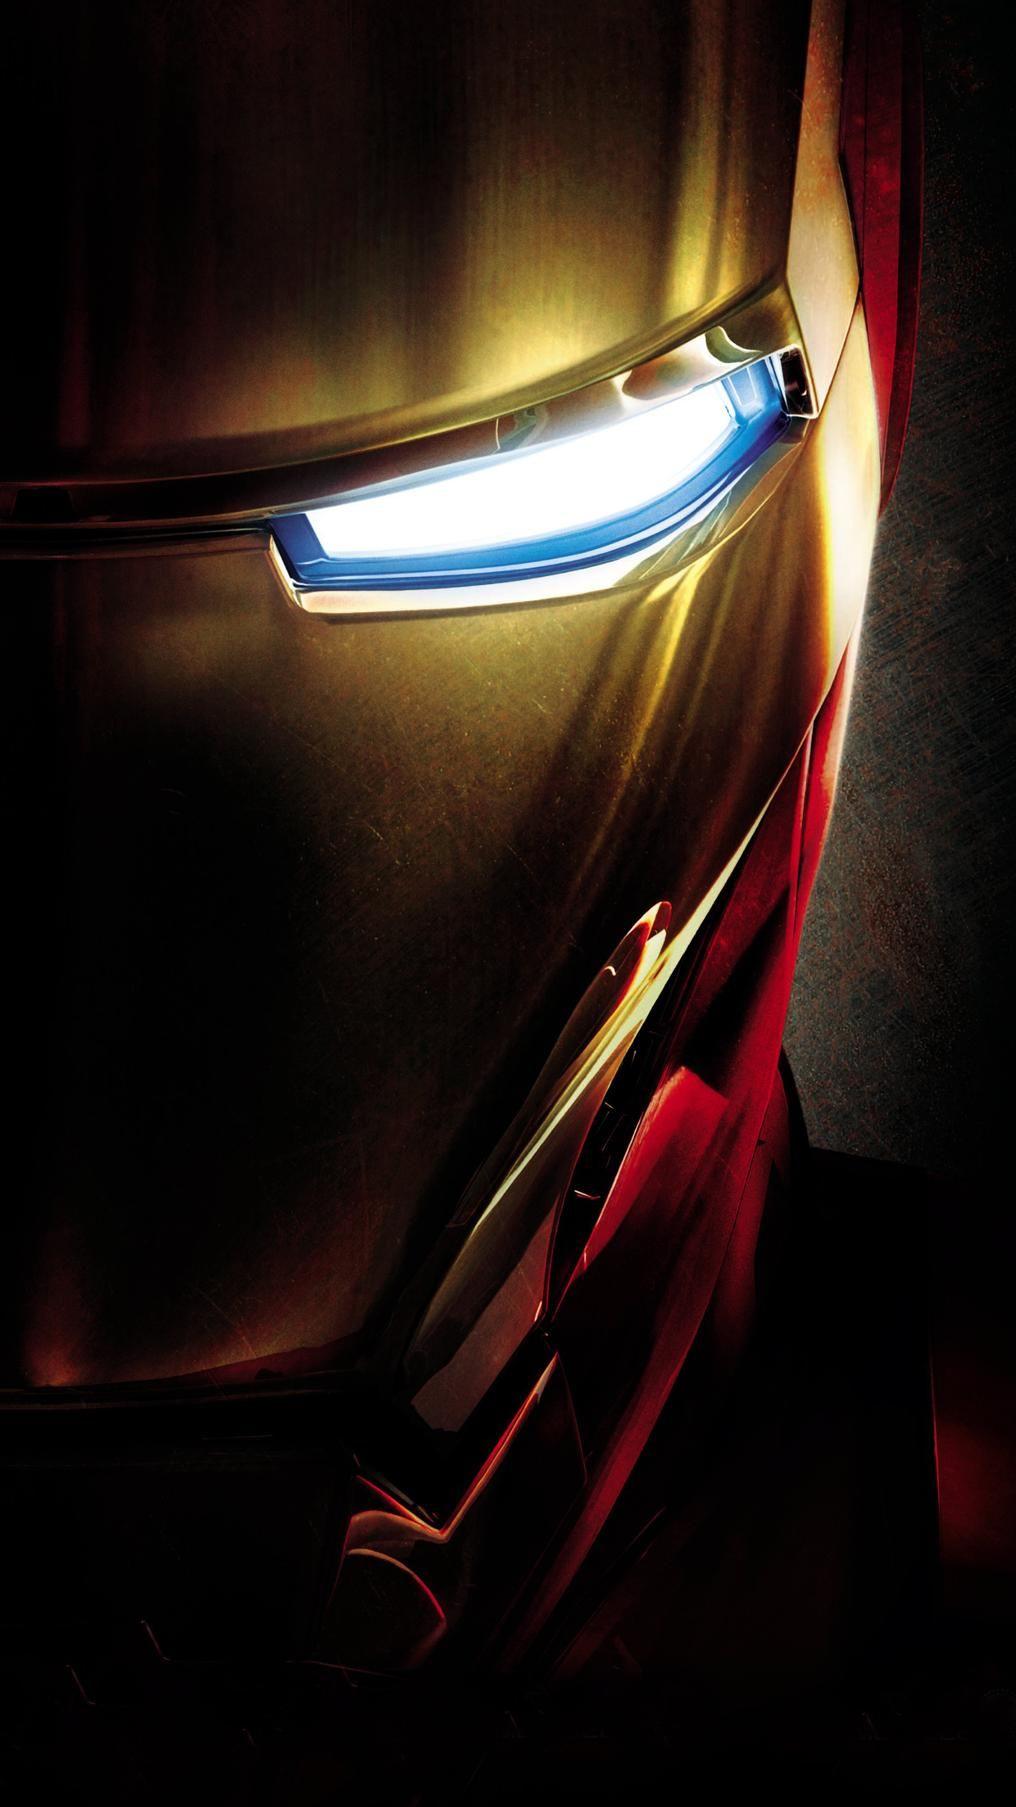 Iron Man (2008) Phone Wallpaper